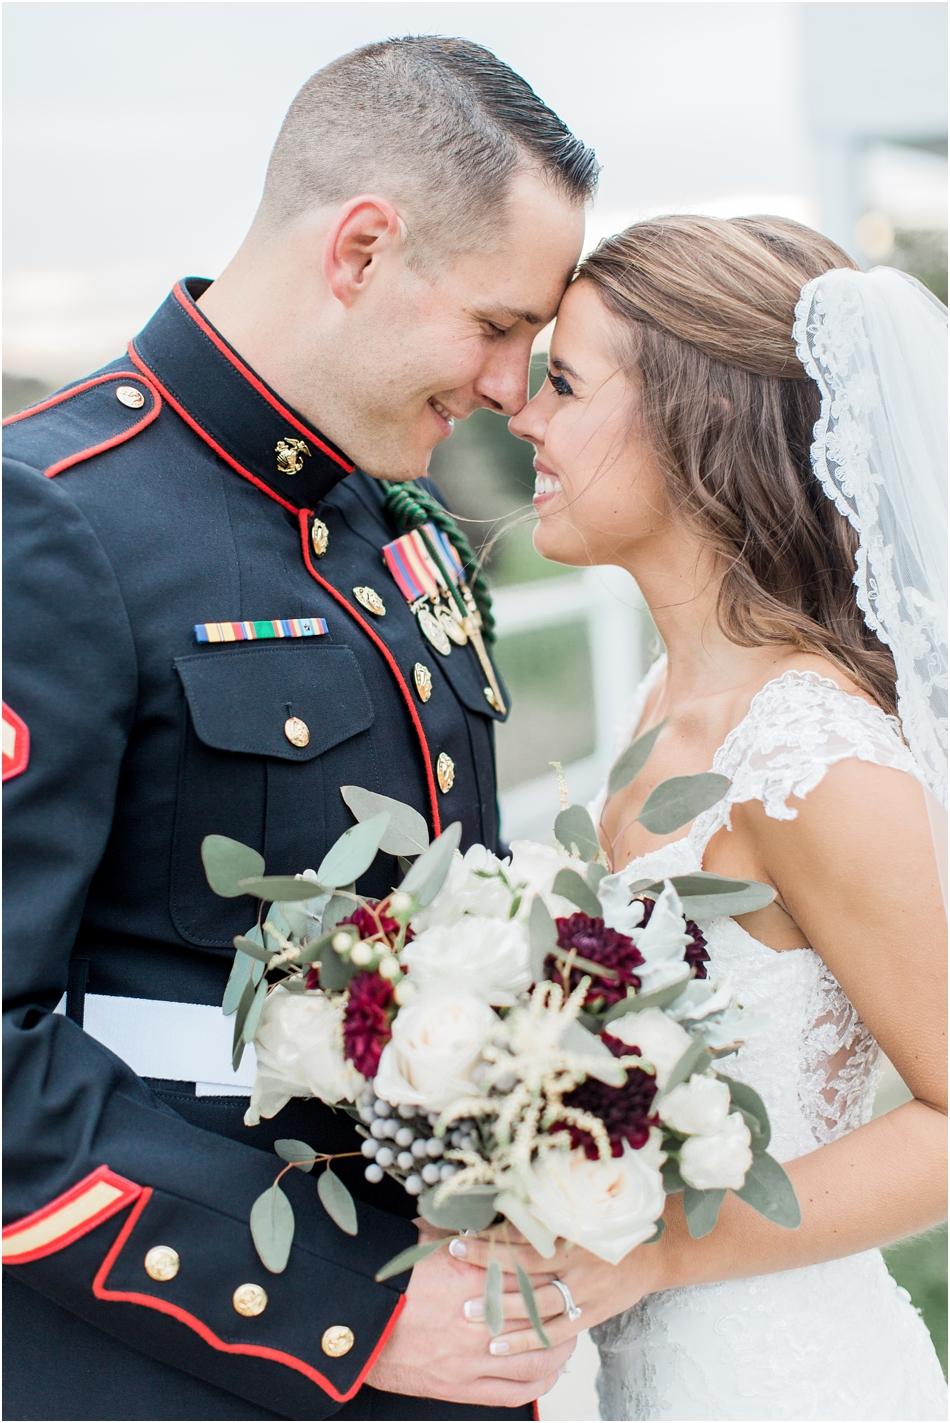 south_shore_country_club_hingham_amanda_chris_cape_cod_boston_new_england_wedding_photographer_Meredith_Jane_Photography_photo_2726.jpg